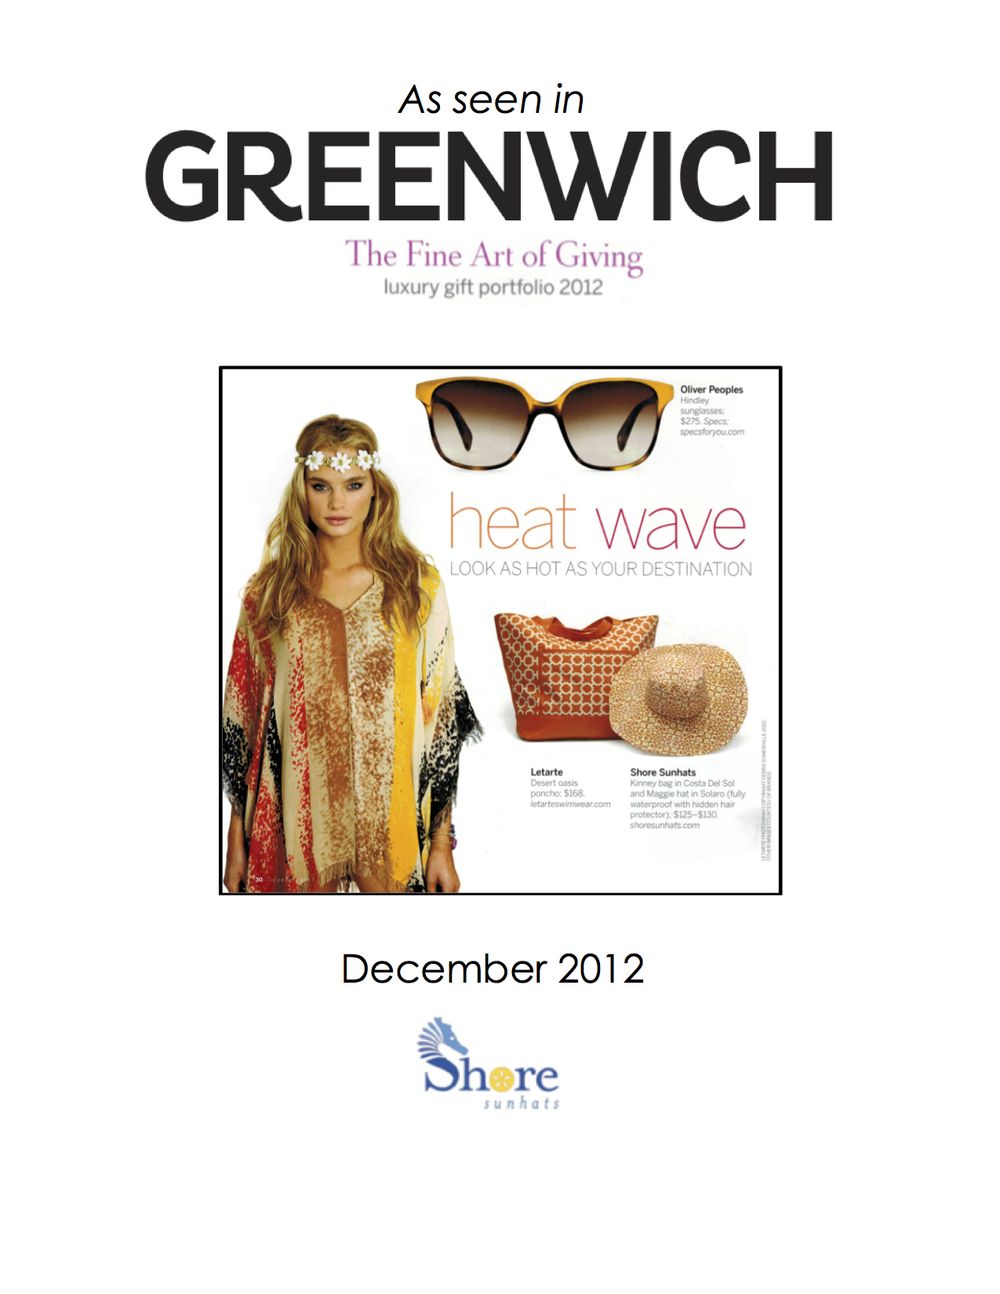 shoresunhats-asseenin-greenwichmag.jpg